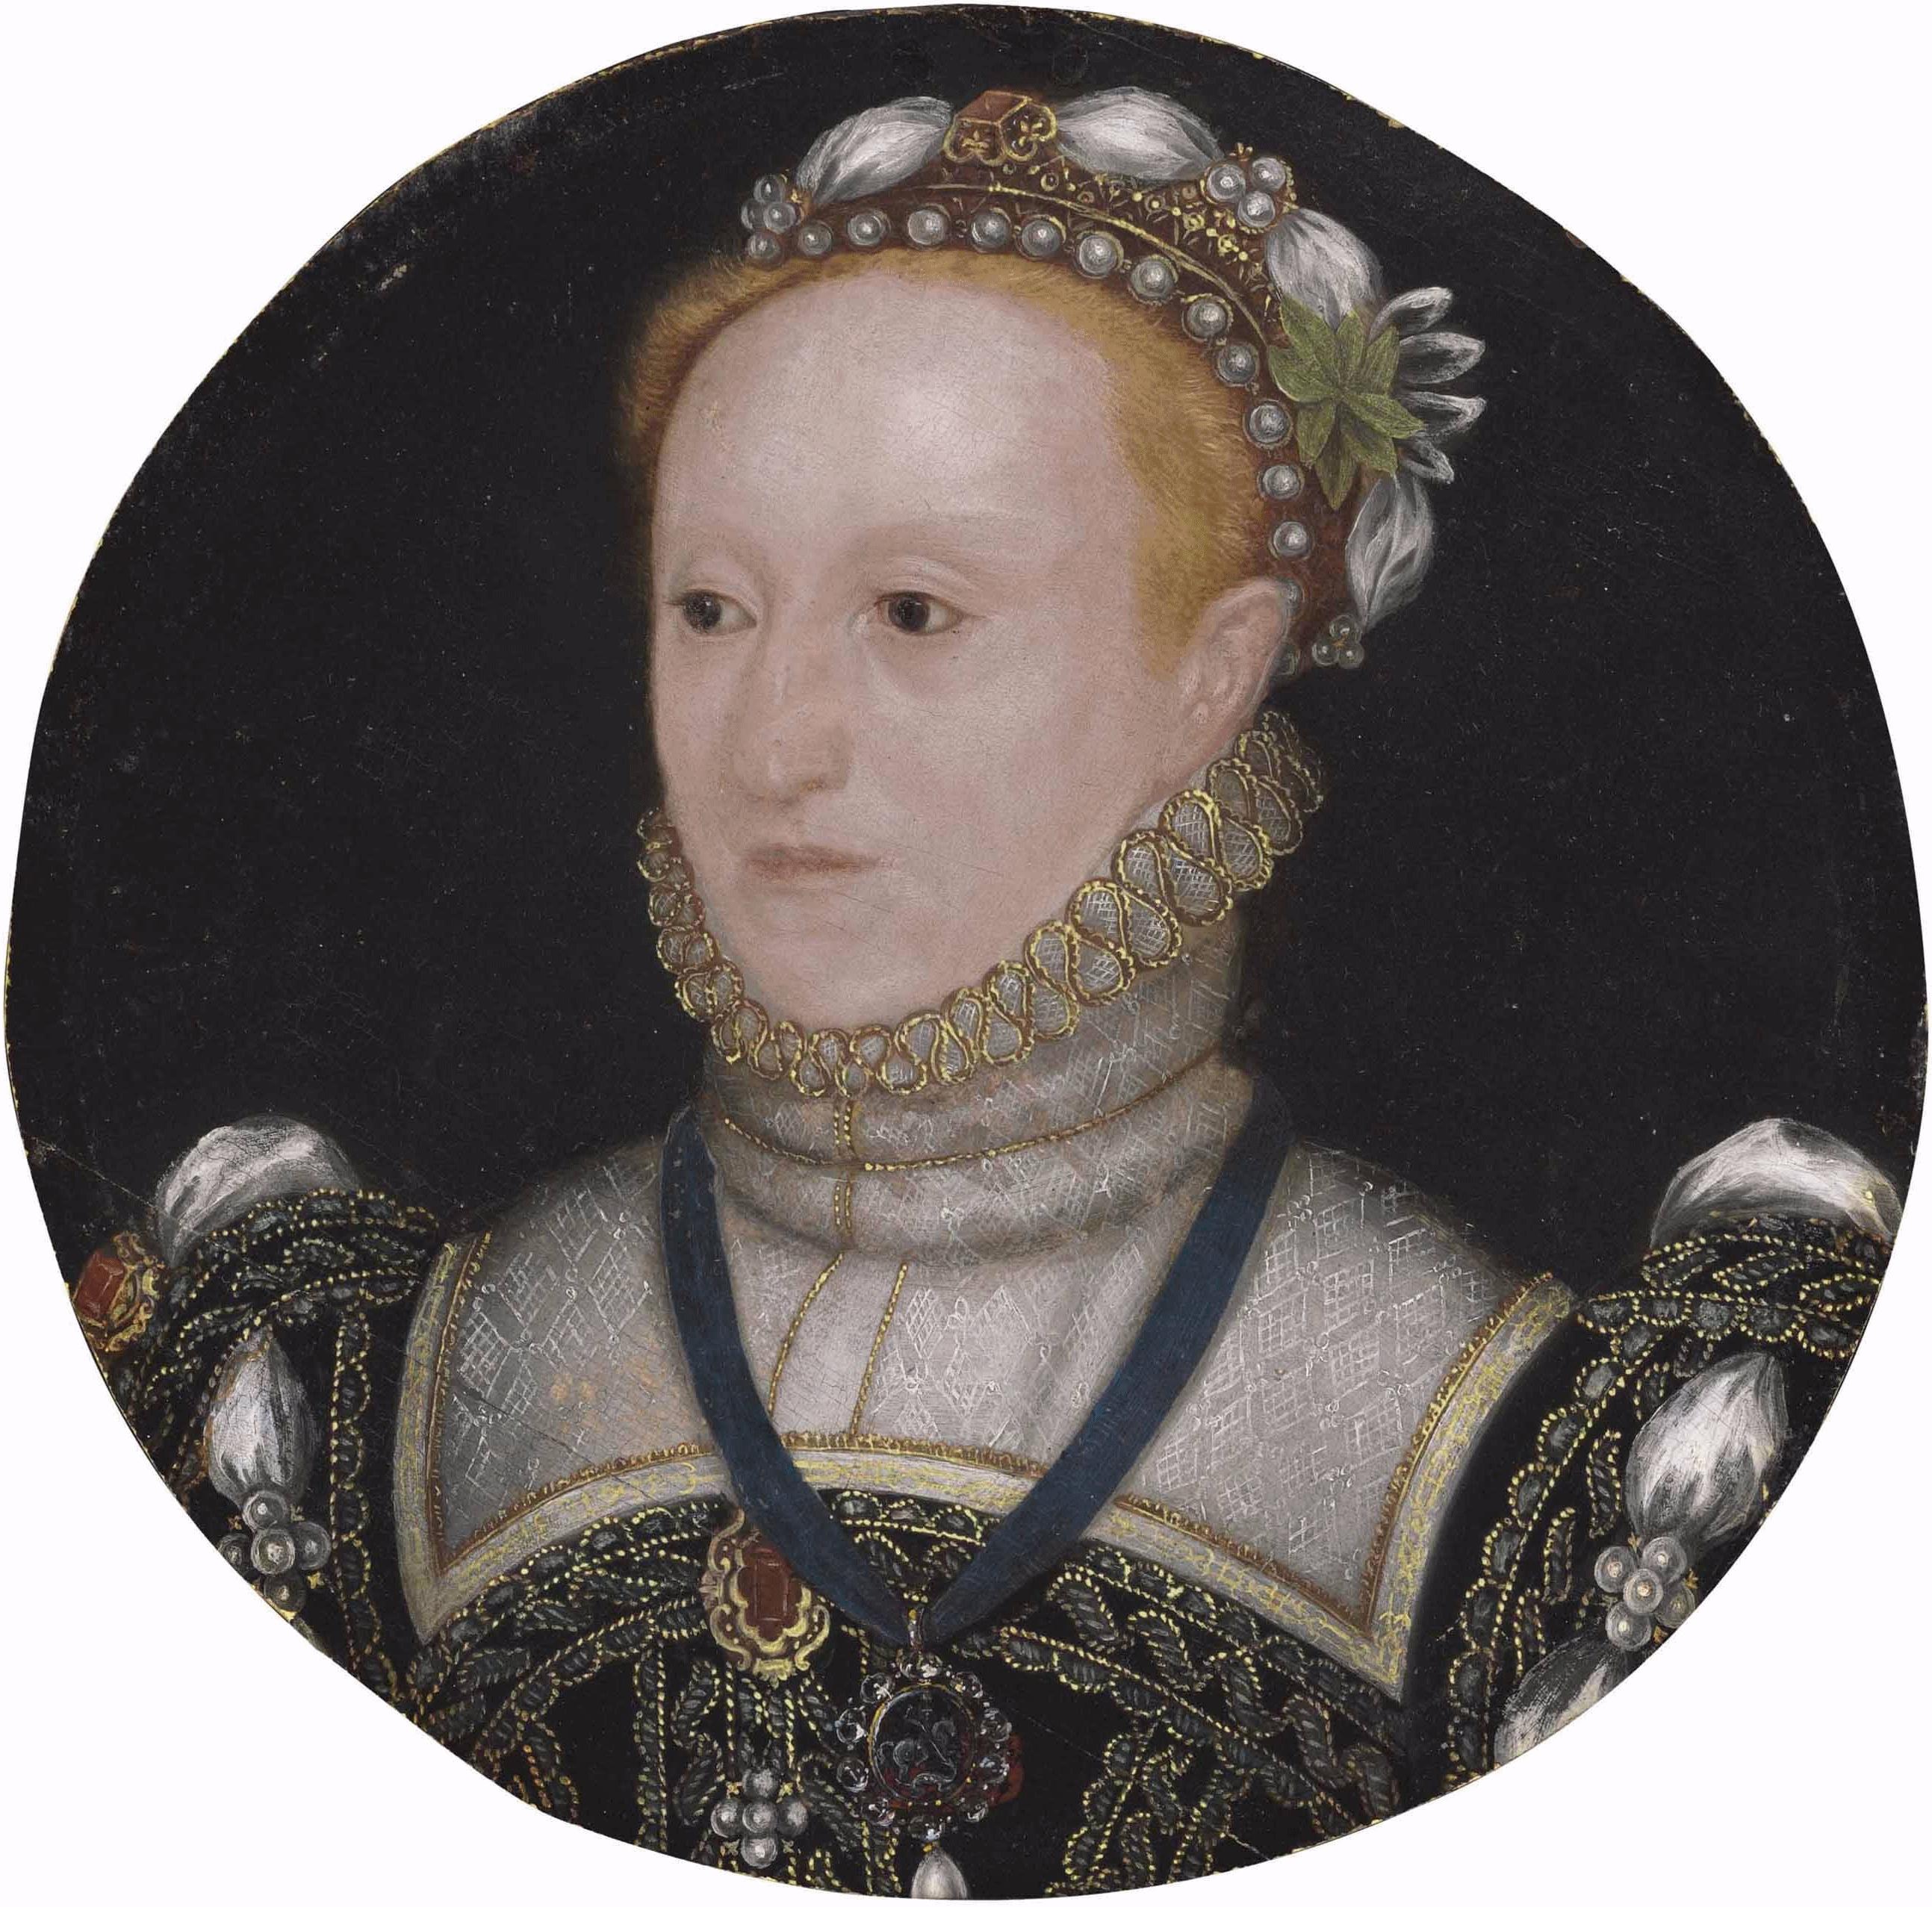 Queen Elizabeth I C 1563 English School Unknown Artist Medium Oil On Panel Dimensions Diameter 10 12 Elizabeth I Miniature Portraits Tudor History